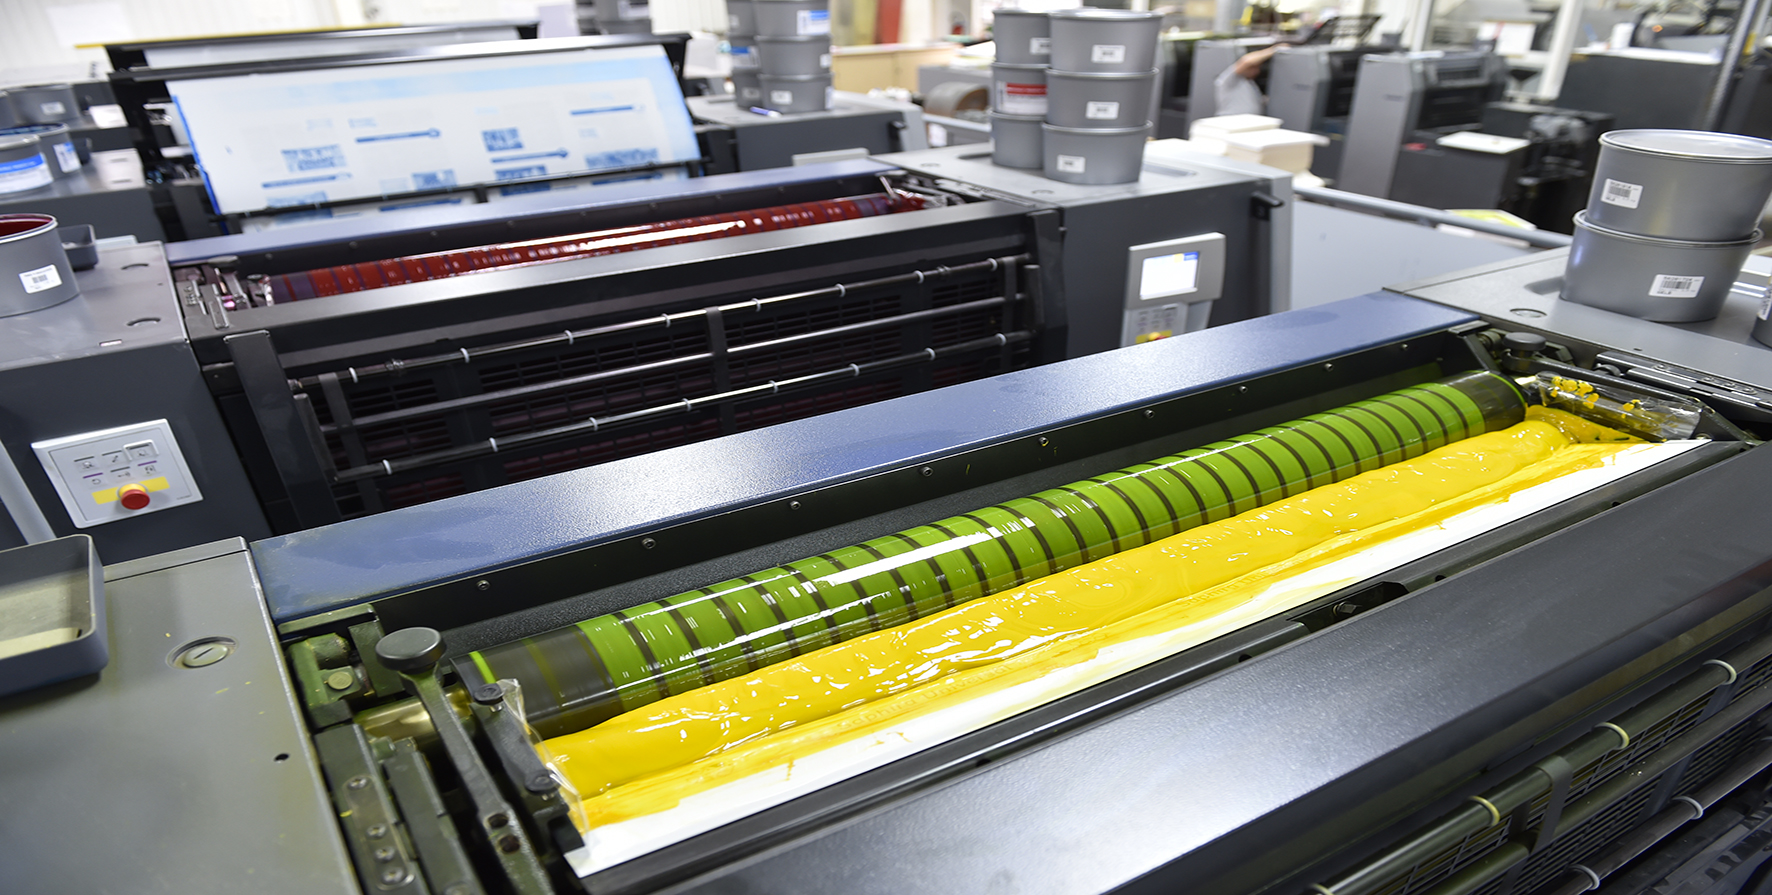 produits imprimés en offset